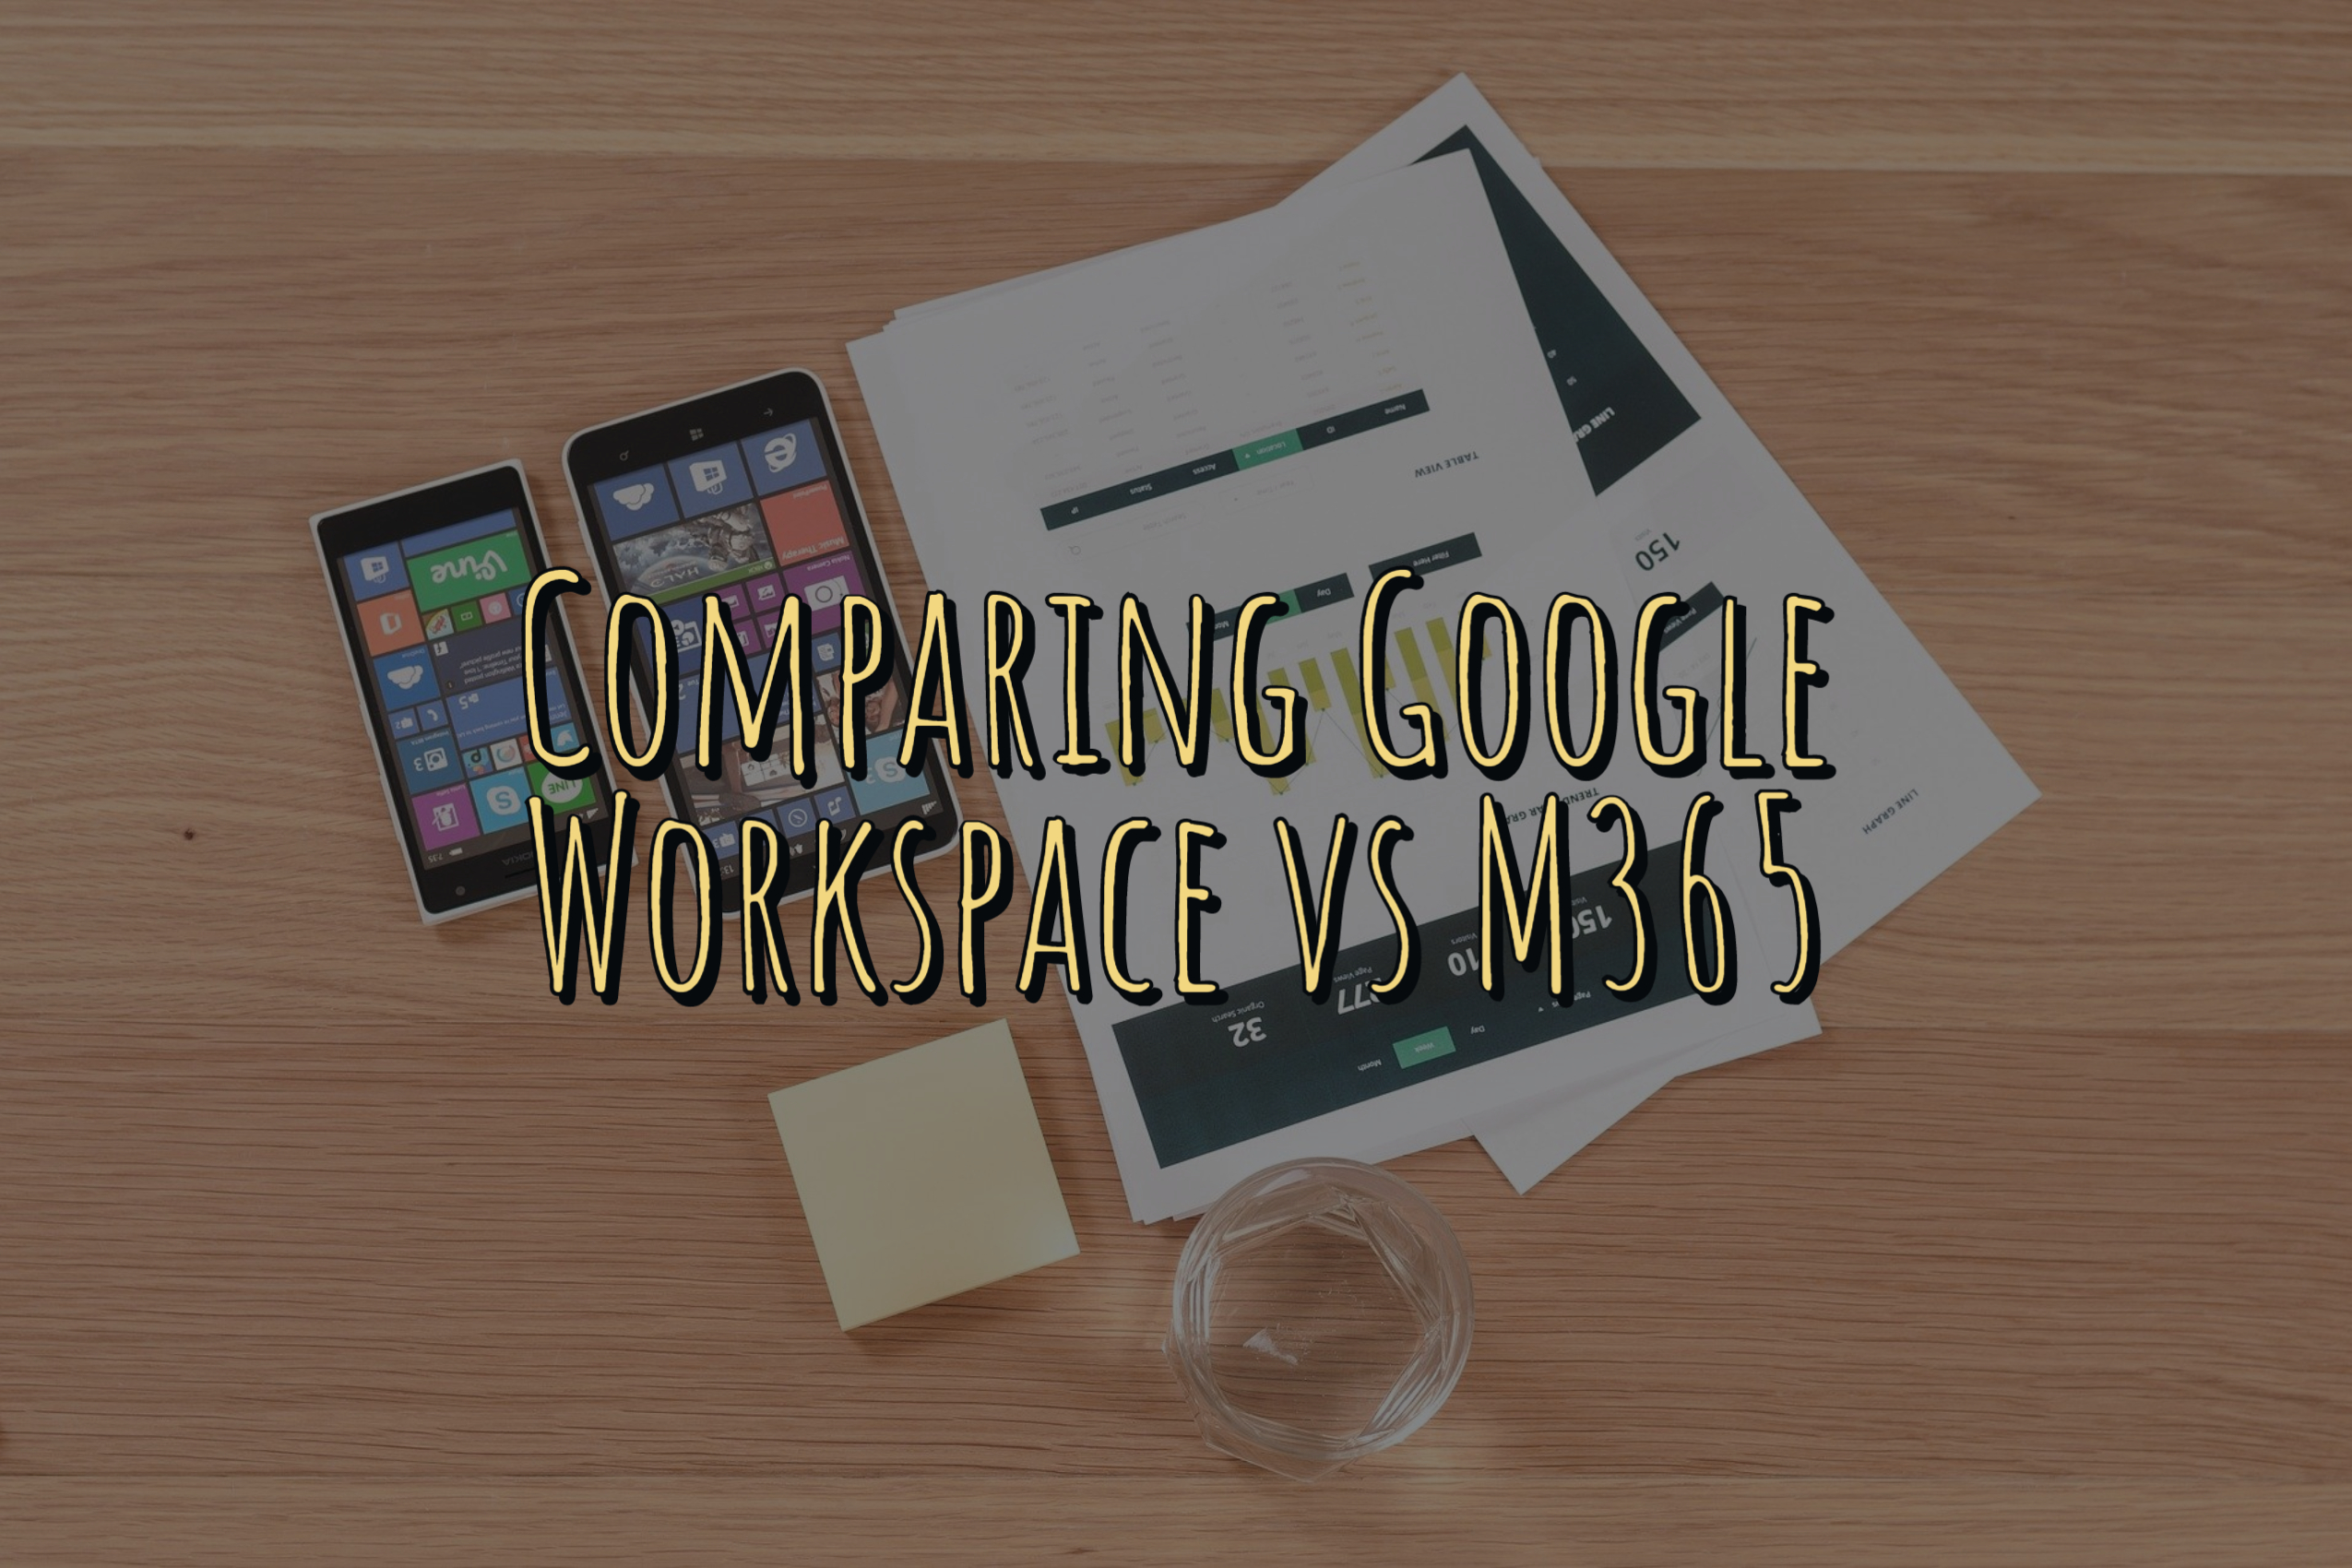 Comparing Google Workspace vs M365